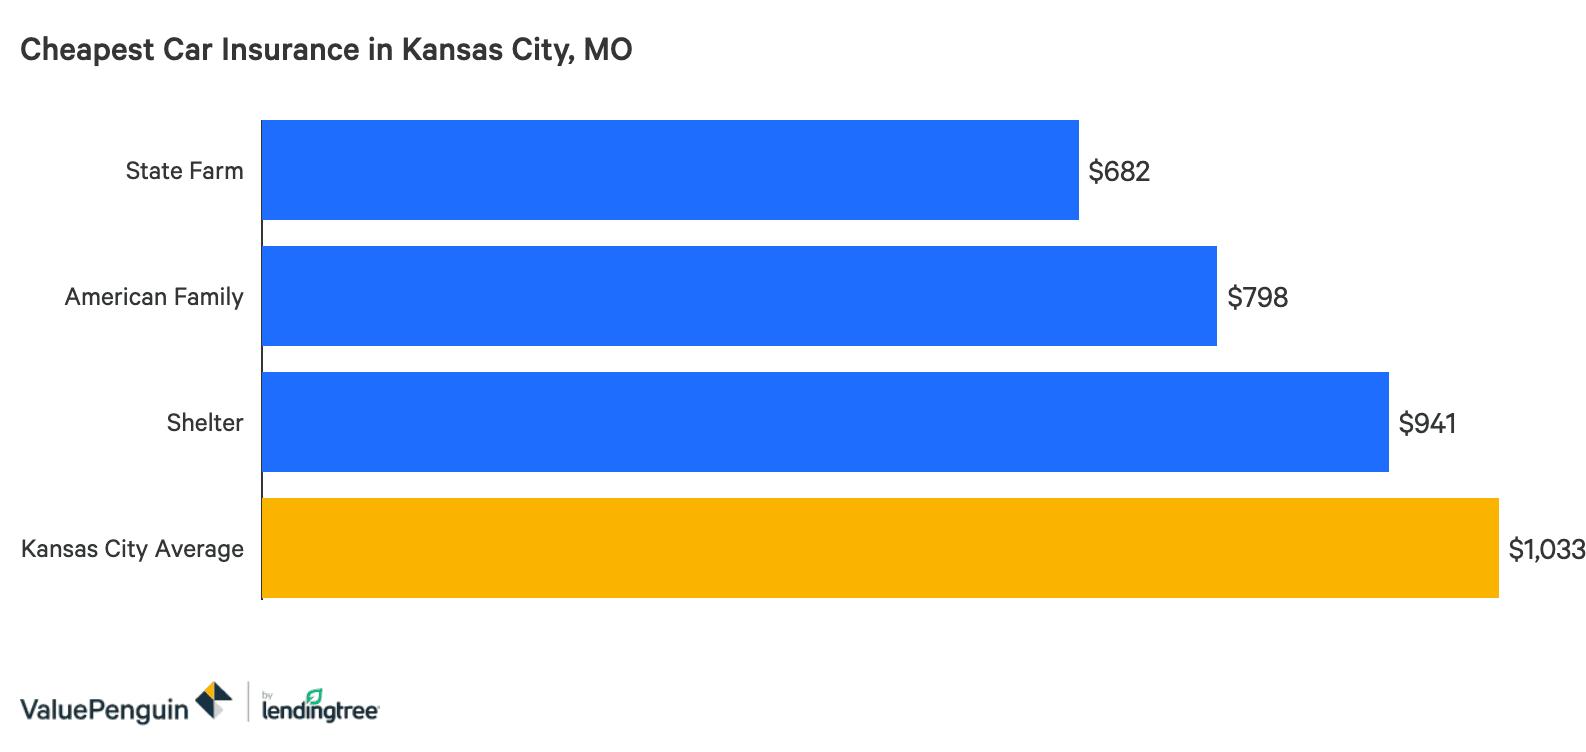 Cheap Car Insurance Quotes In Kansas City Missouri Valuepenguin